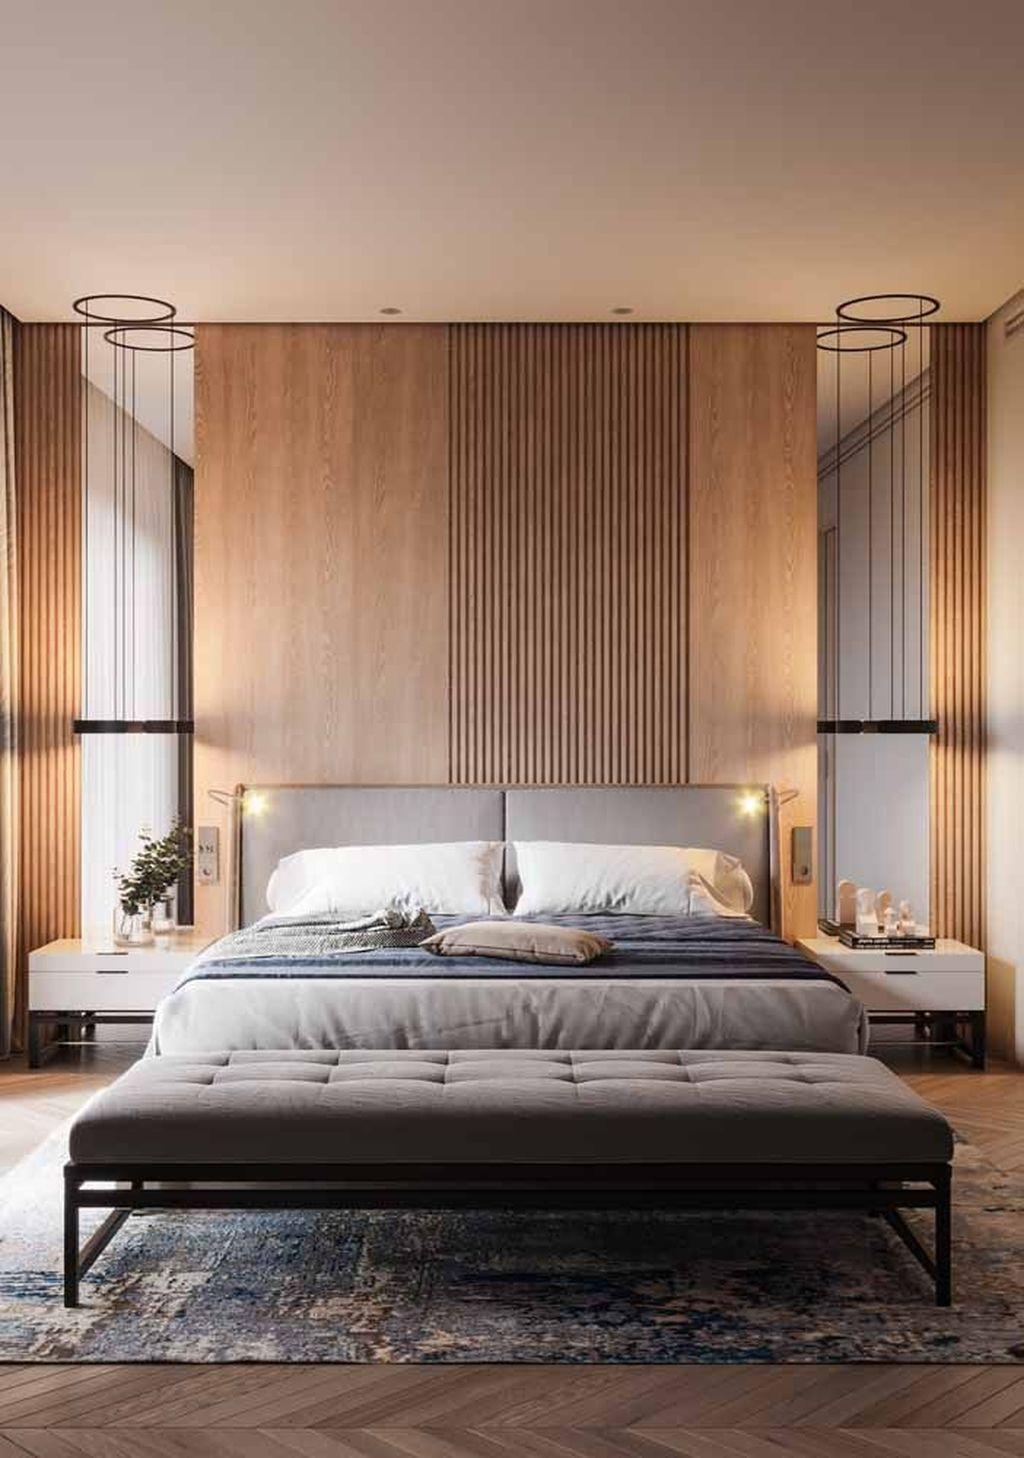 Simple Things For Your Scandinavian Bedroom Decor Ideas Luxurious Bedrooms Bedroom Design Contemporary Bedroom